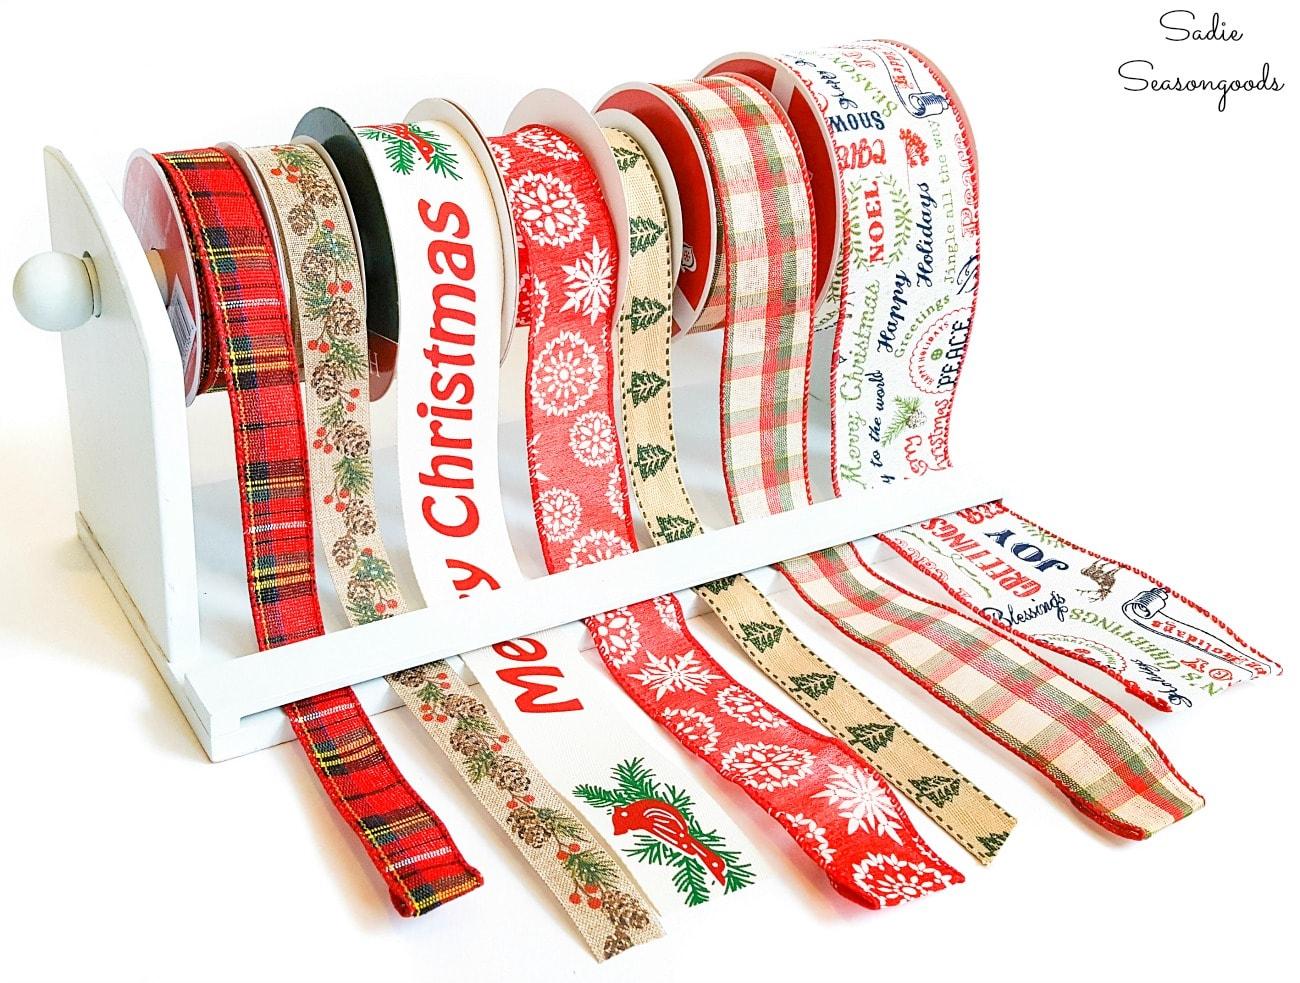 Craft ribbon storage or ribbon spool holder